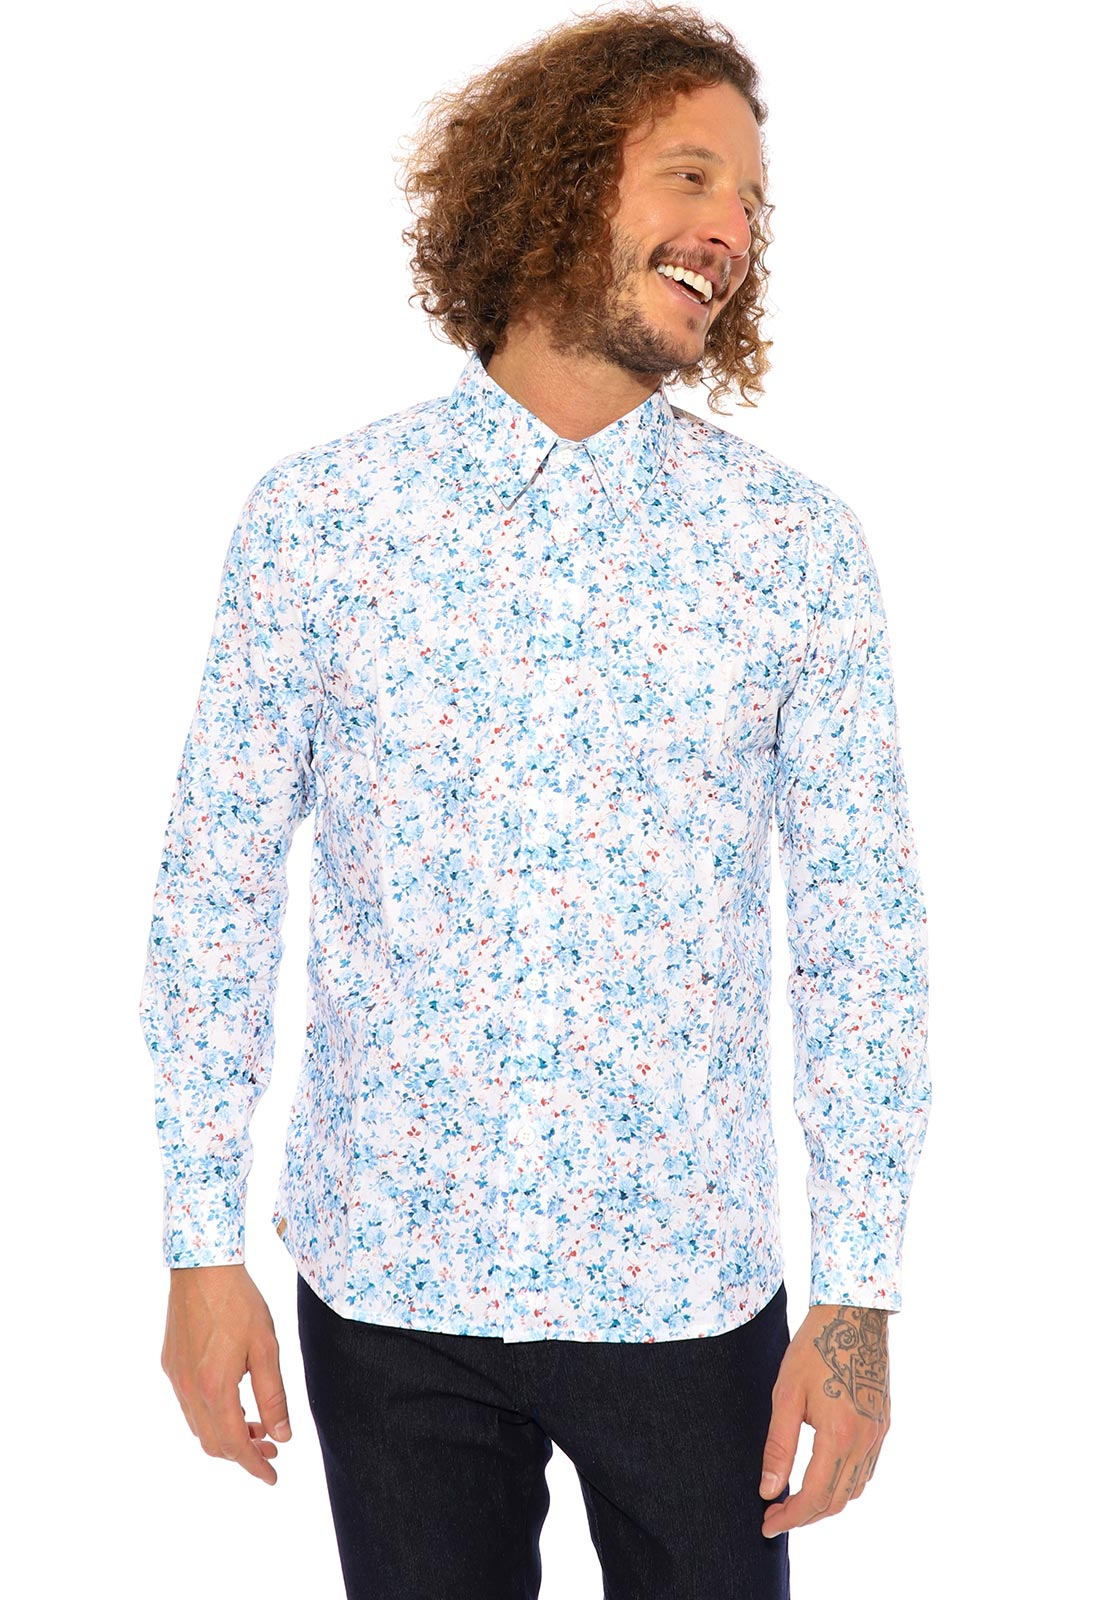 Camisa de Viscose Vida Marinha Manga Longa Branco/Floral